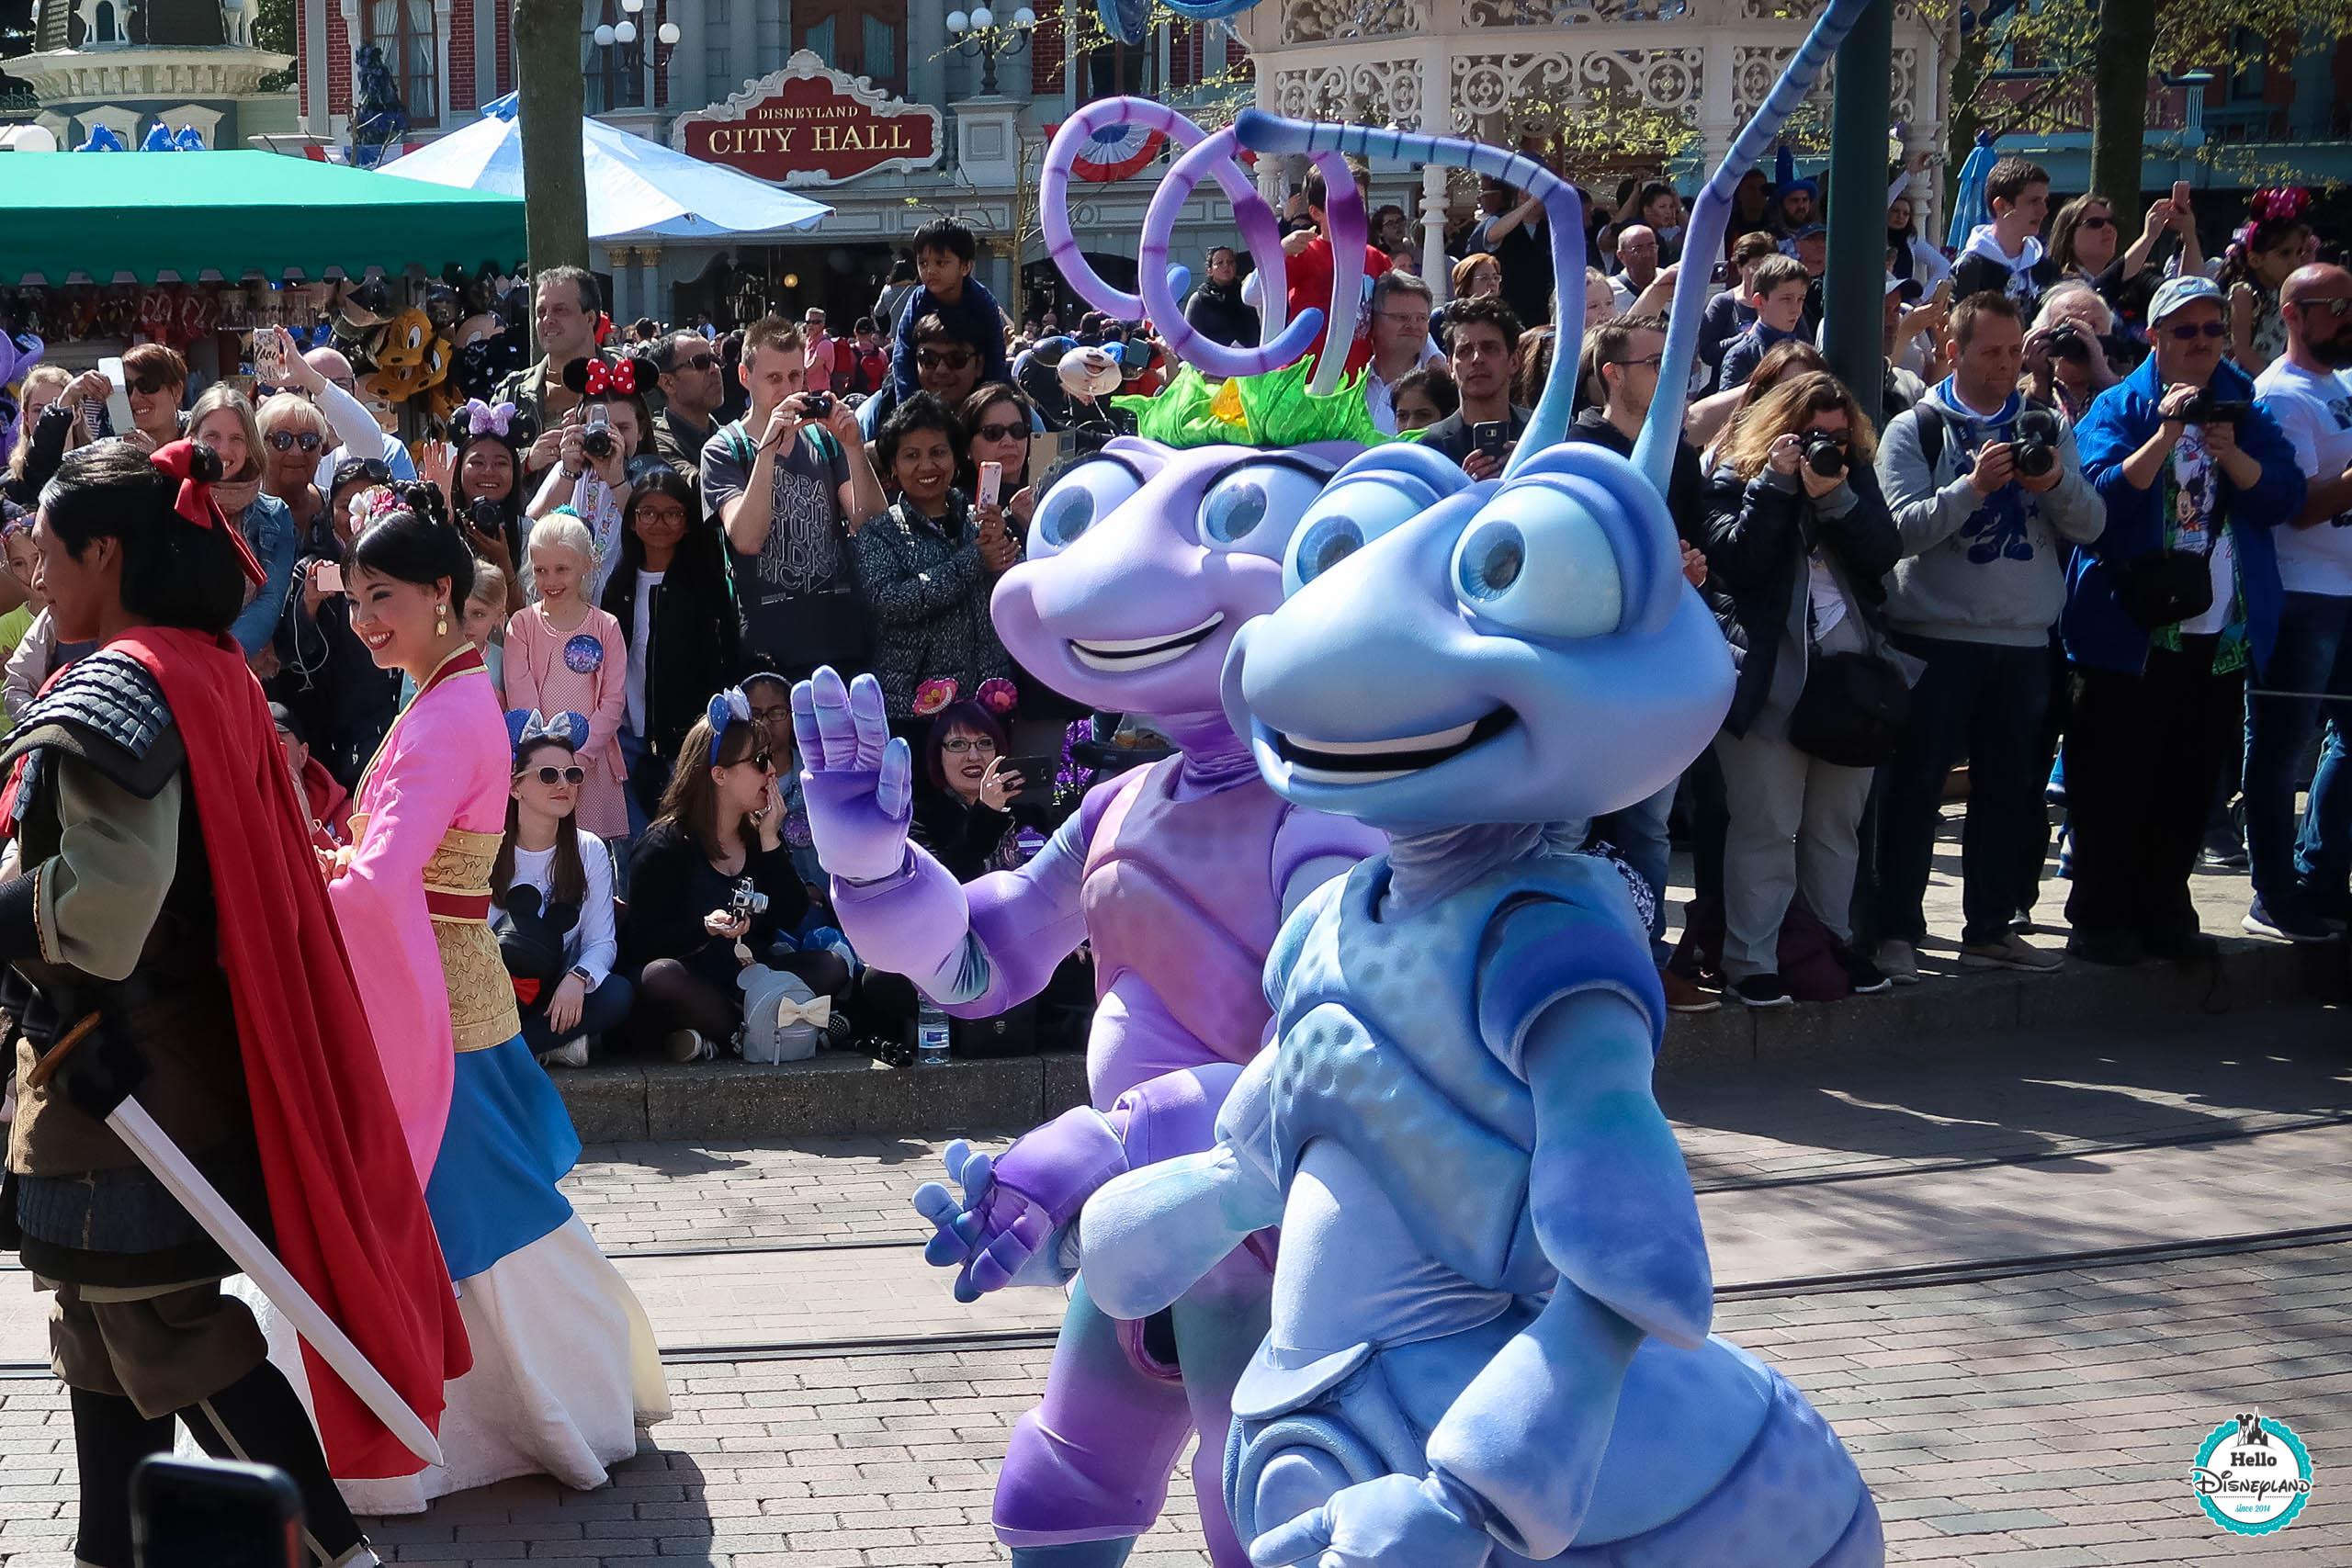 12 avril 2017 - Disneyland Paris 25 ans